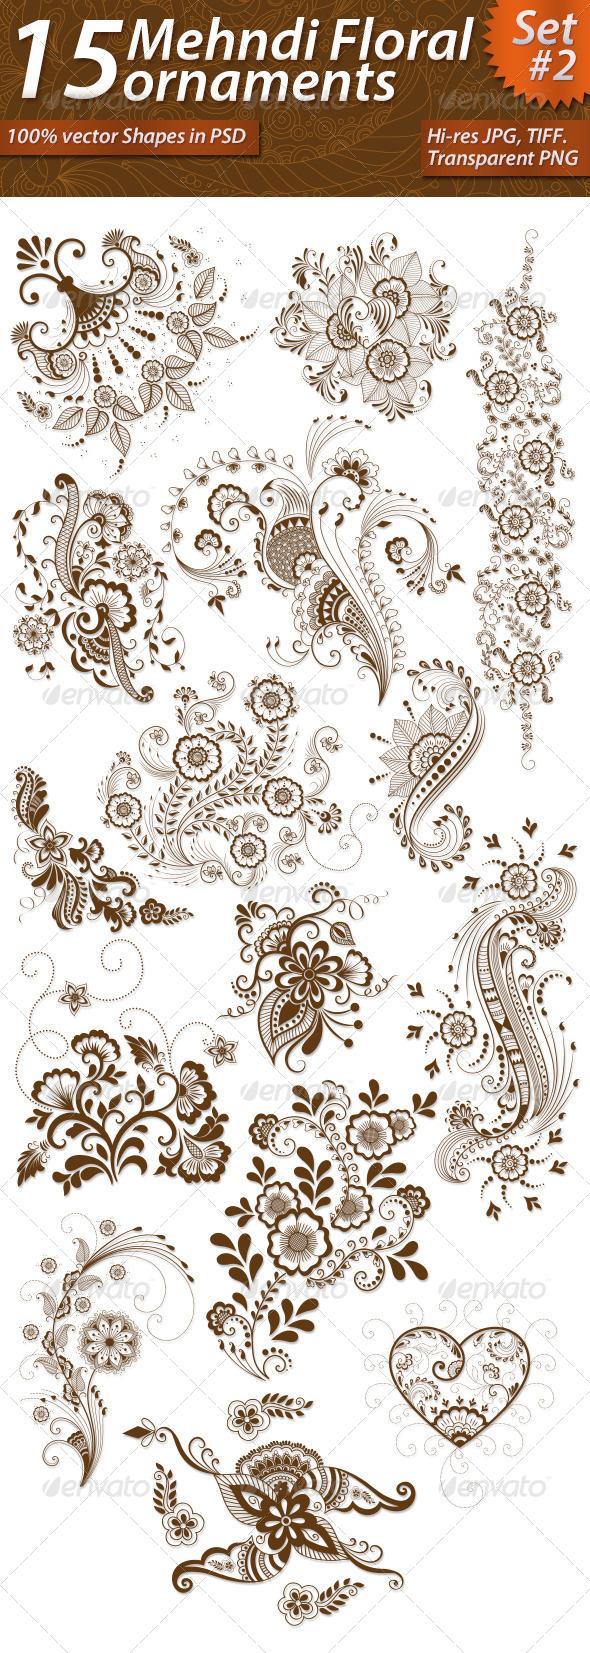 GraphicRiver 15 Mehndi Floral Ornaments Set#2 7387176